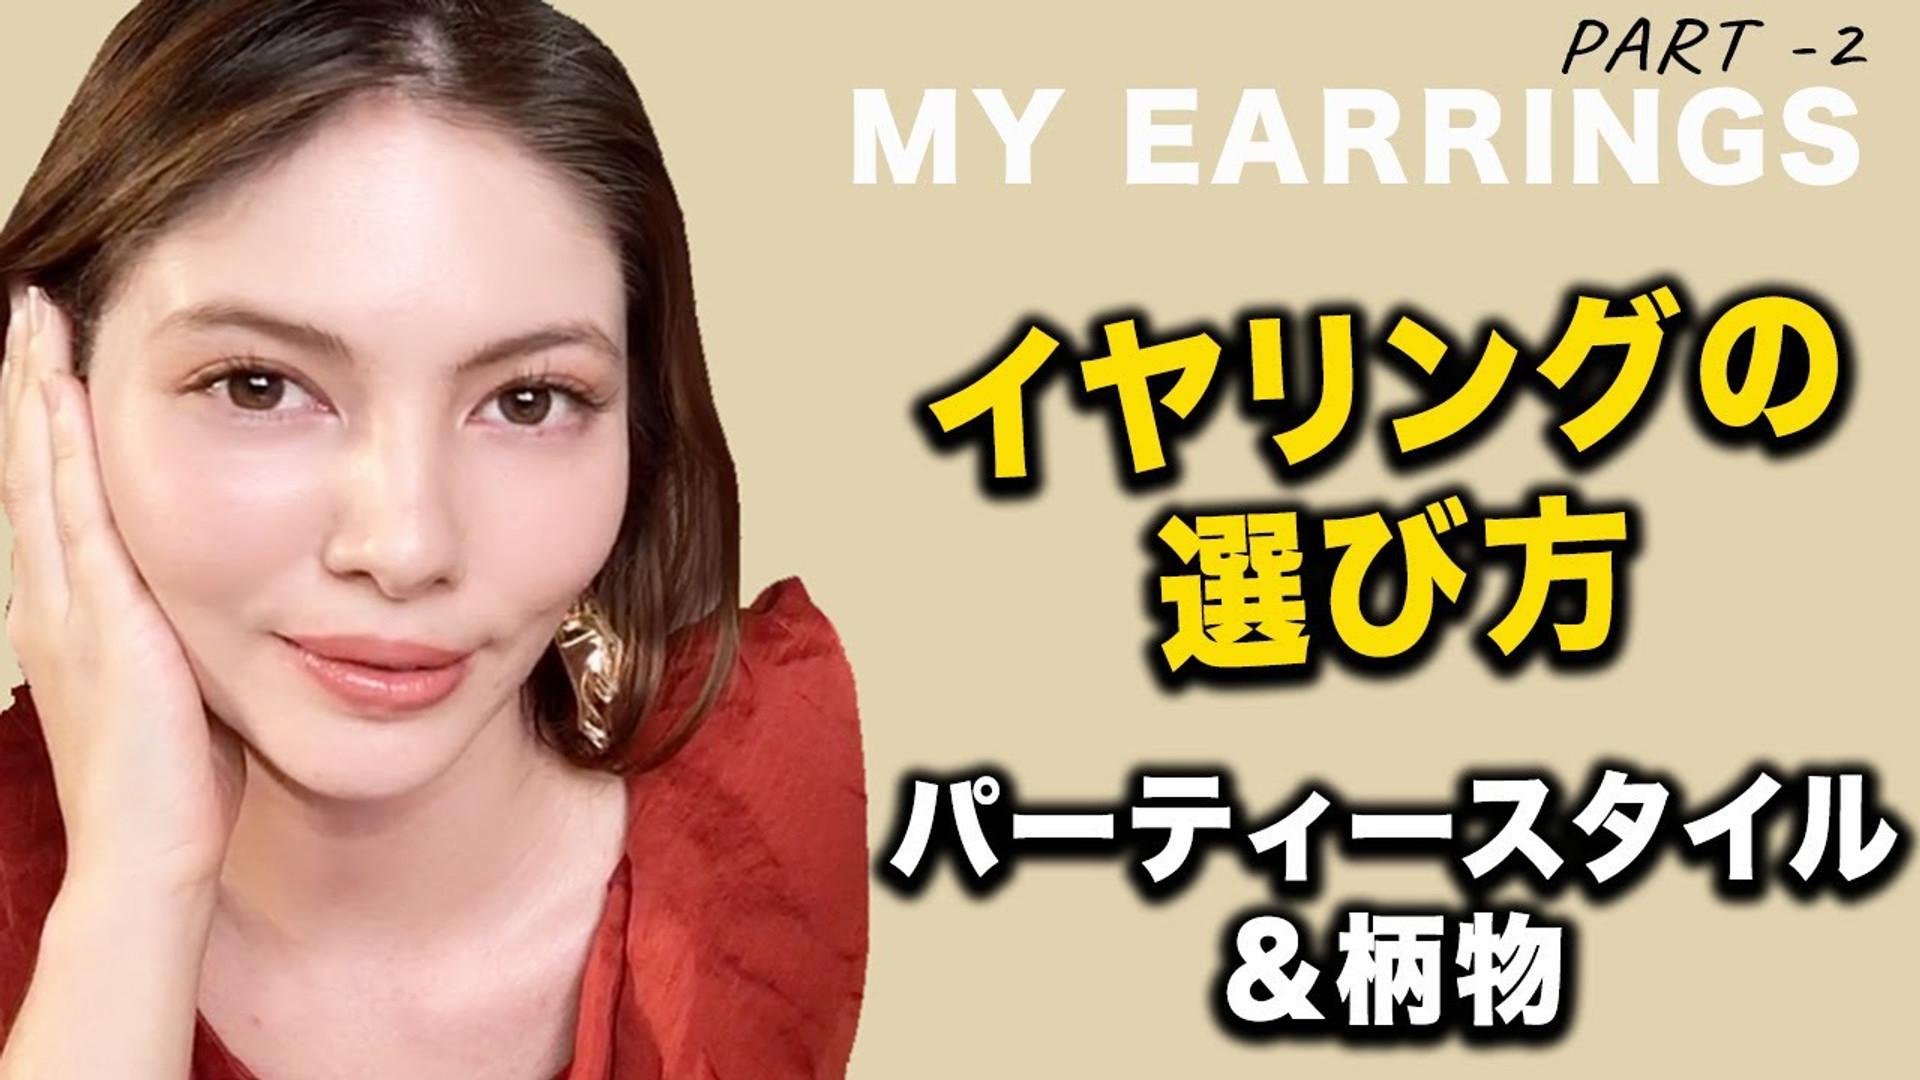 My earring Part 2 - Youtube